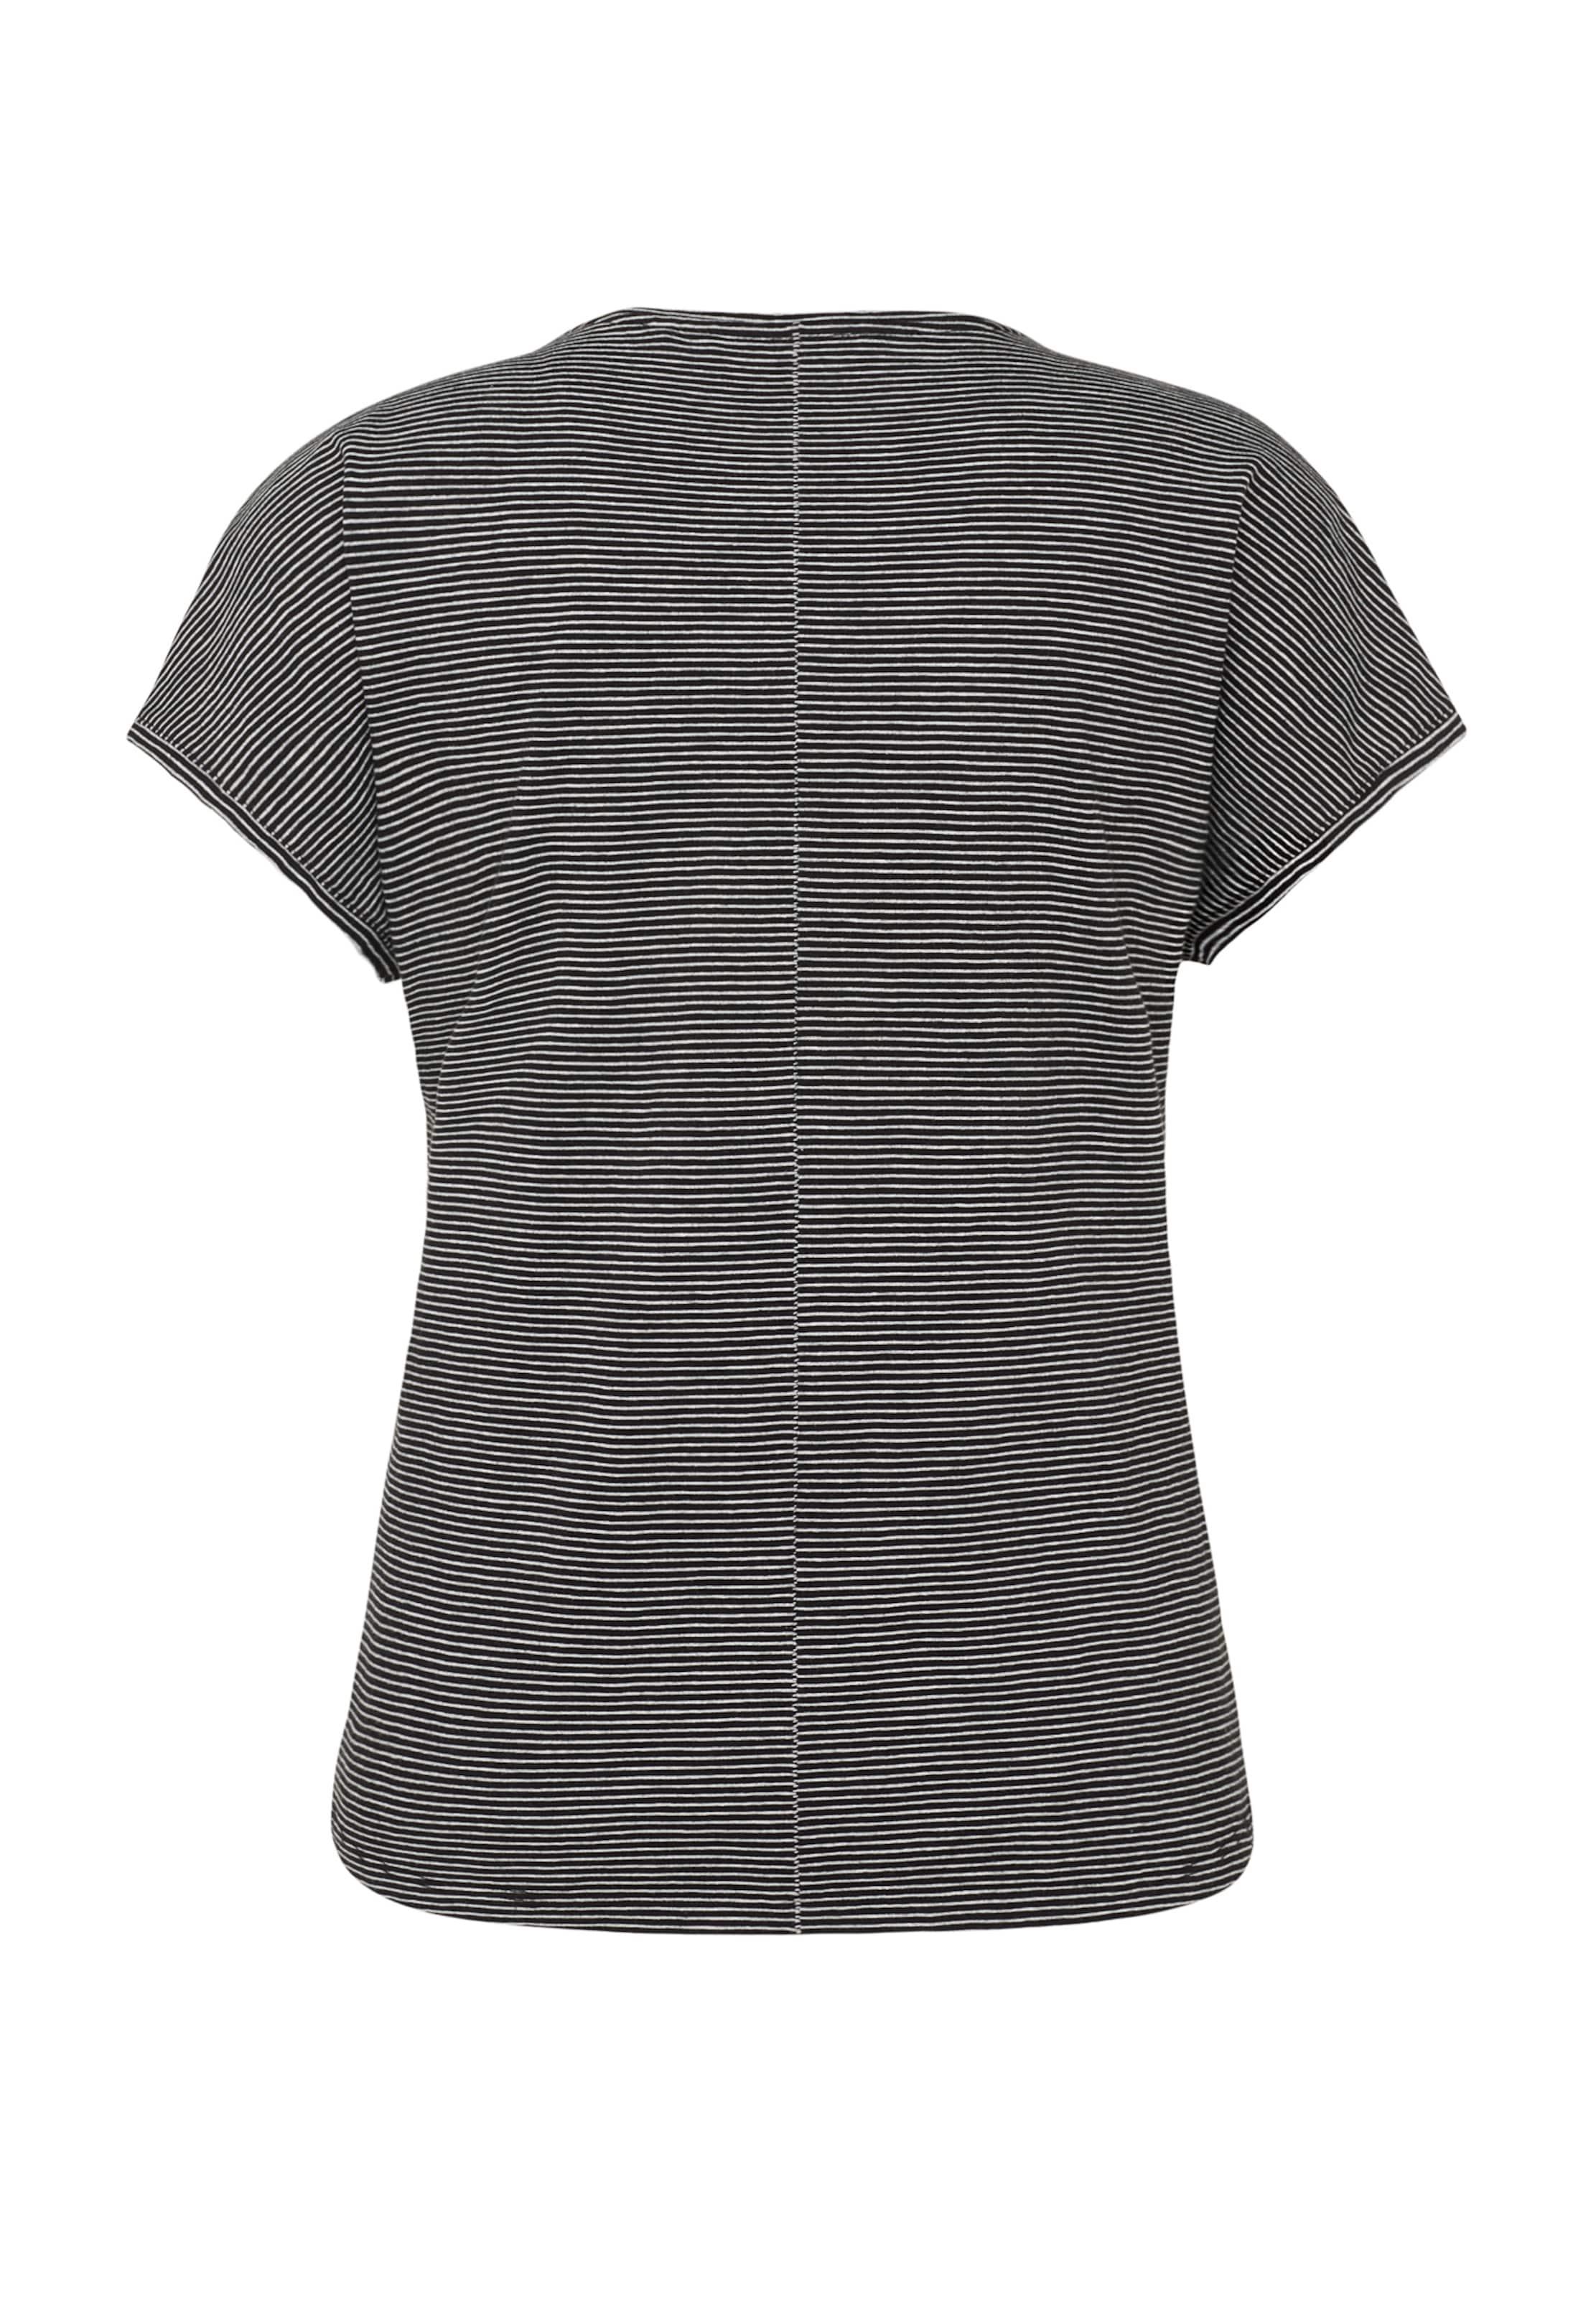 'stripes' AnthrazitSchwarz shirt In Recolution T jpGqMLSVUz